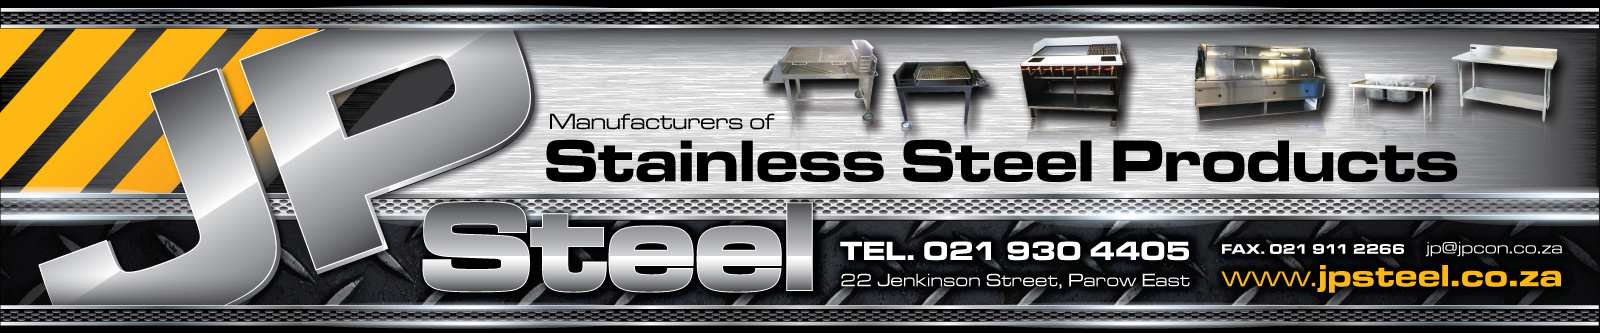 JP Steel